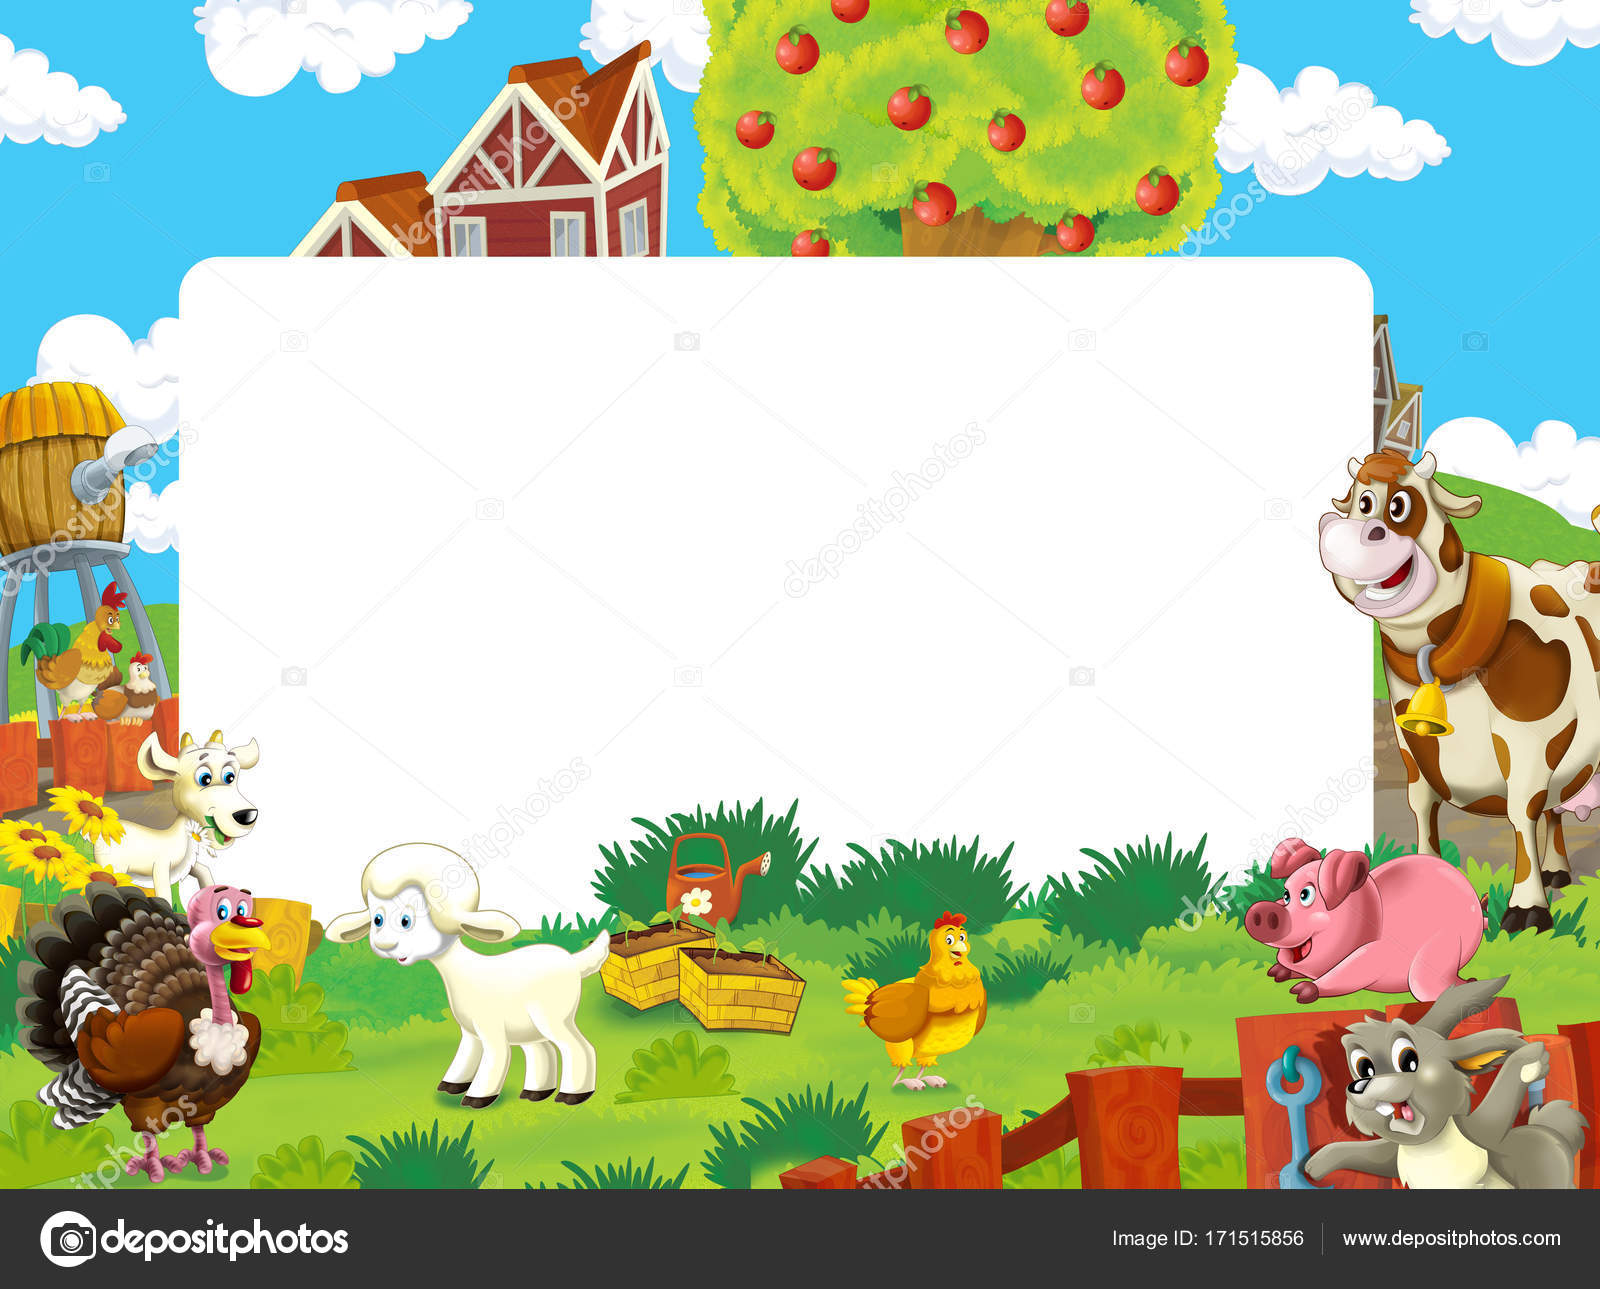 Fondos Animados Para Celular De Animales: Marcos Para Fotos De Animales